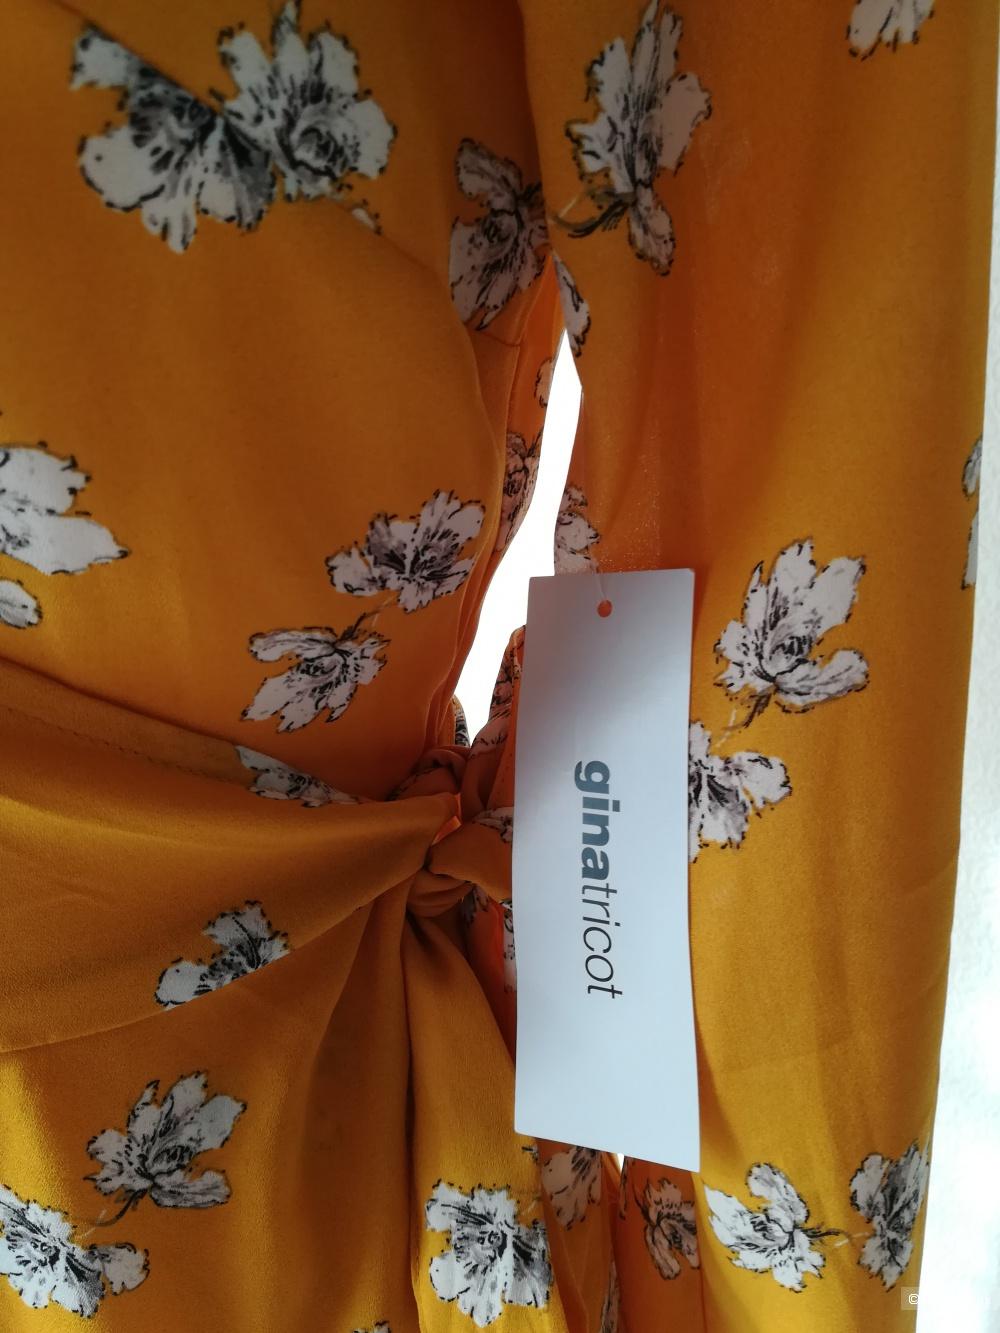 Платье Gina tricot, размер 42-44